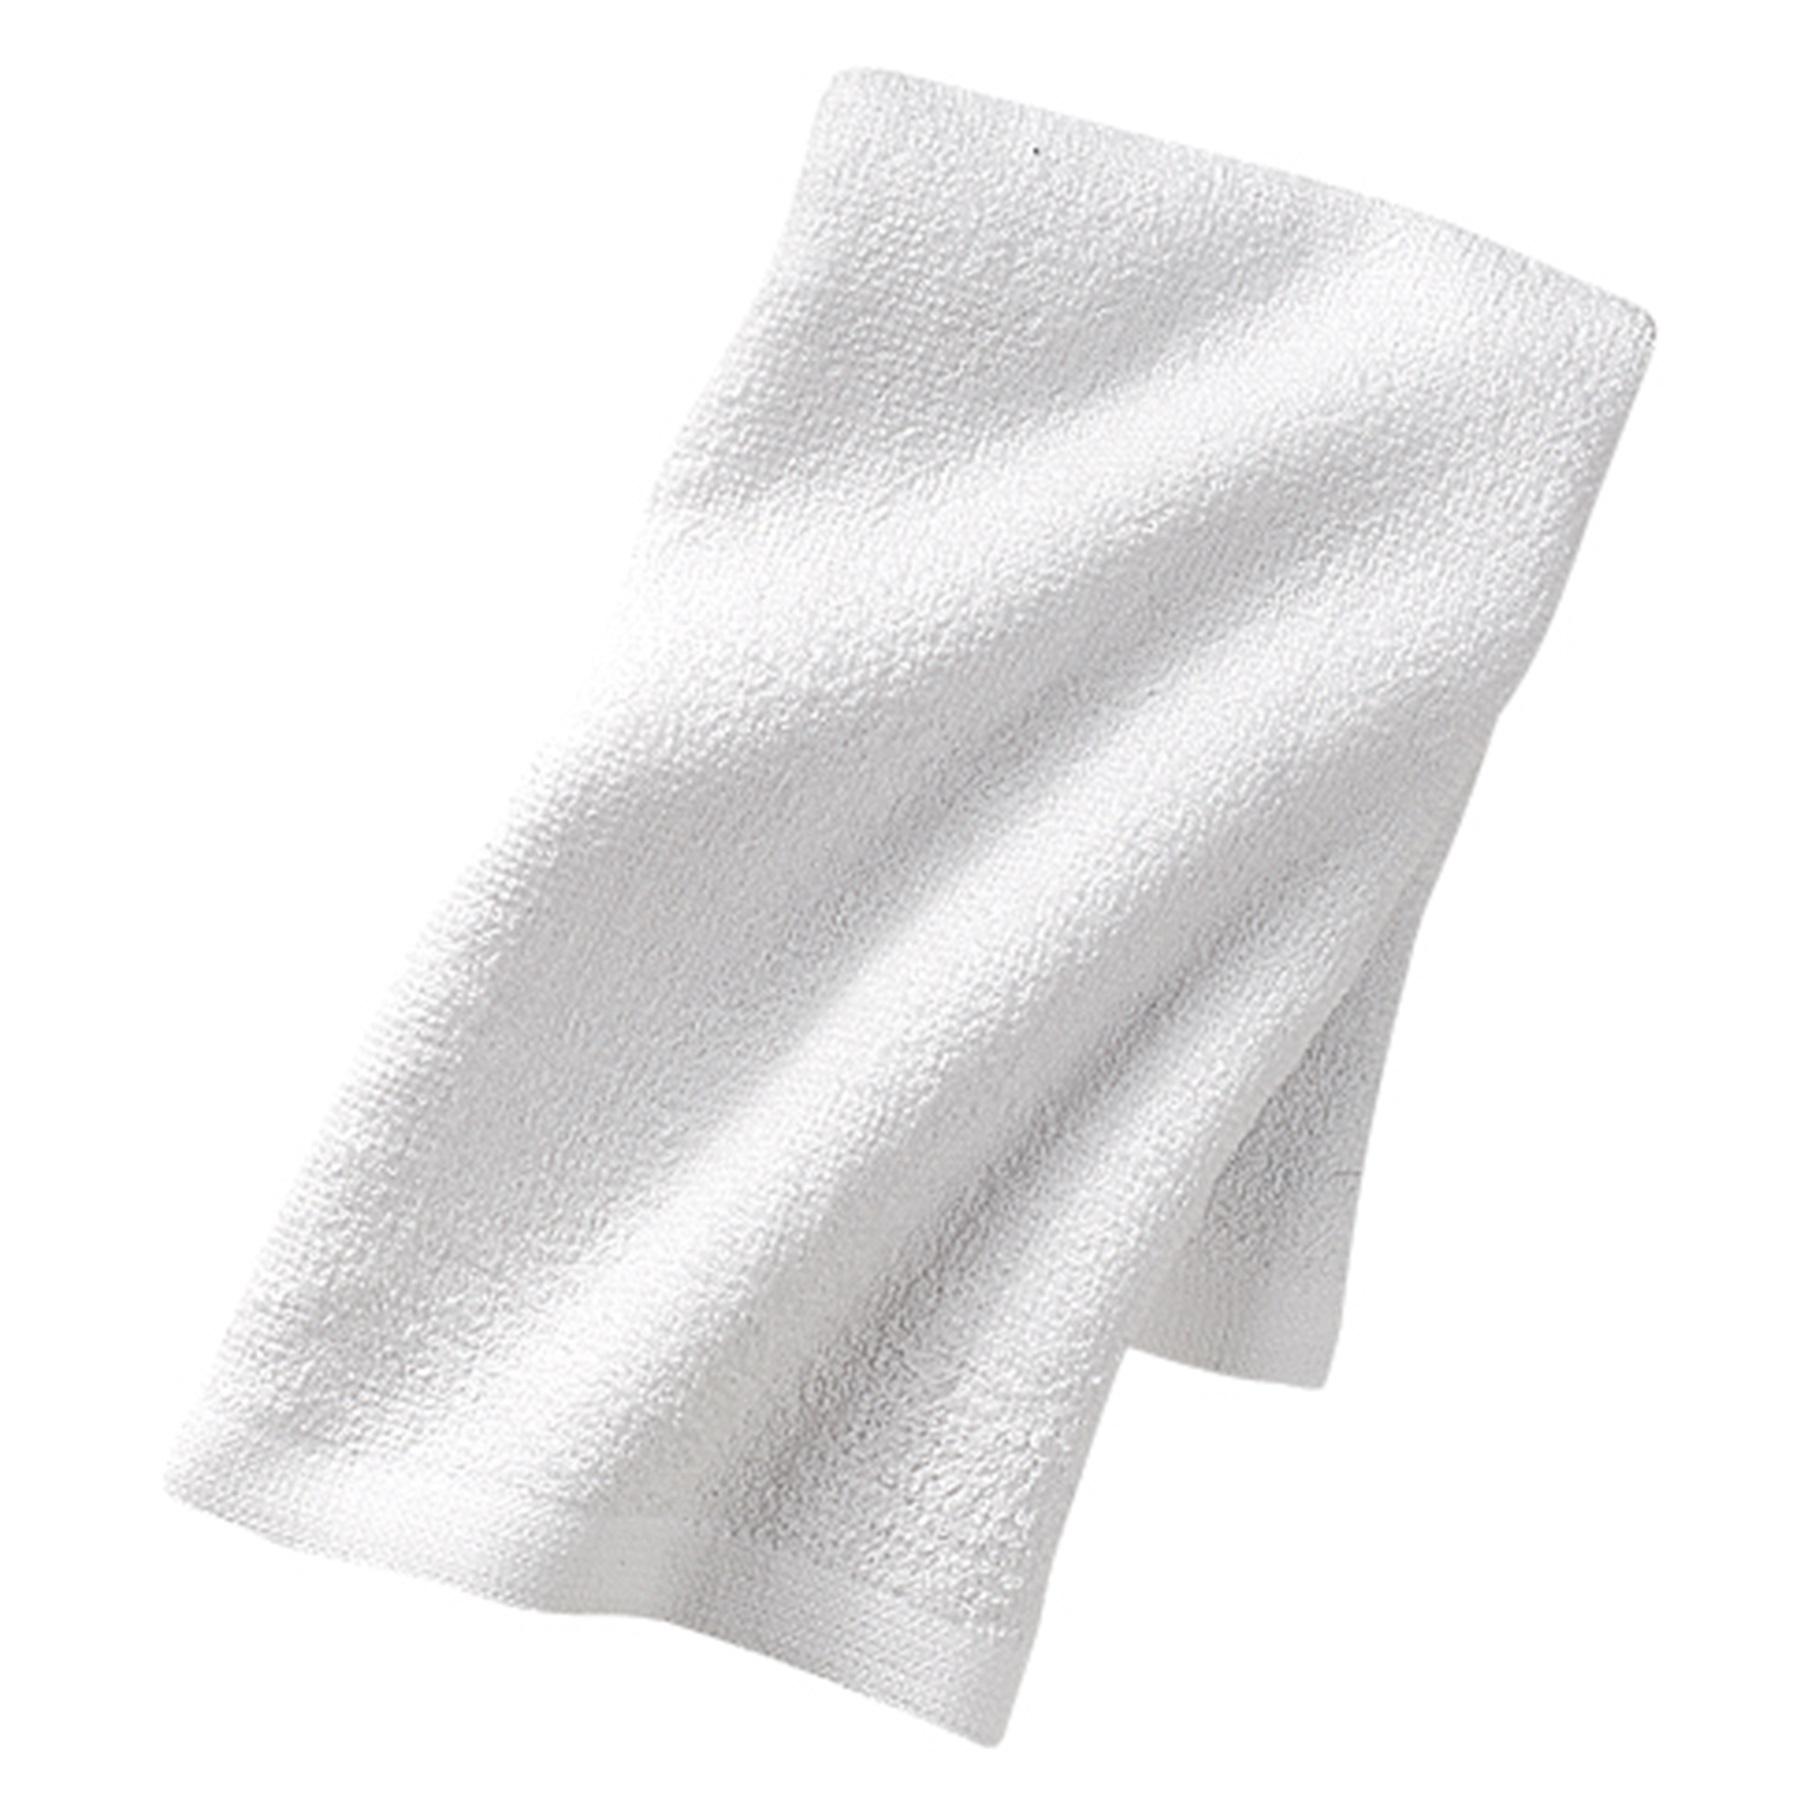 Port & Company PT38 Rally Towel - White